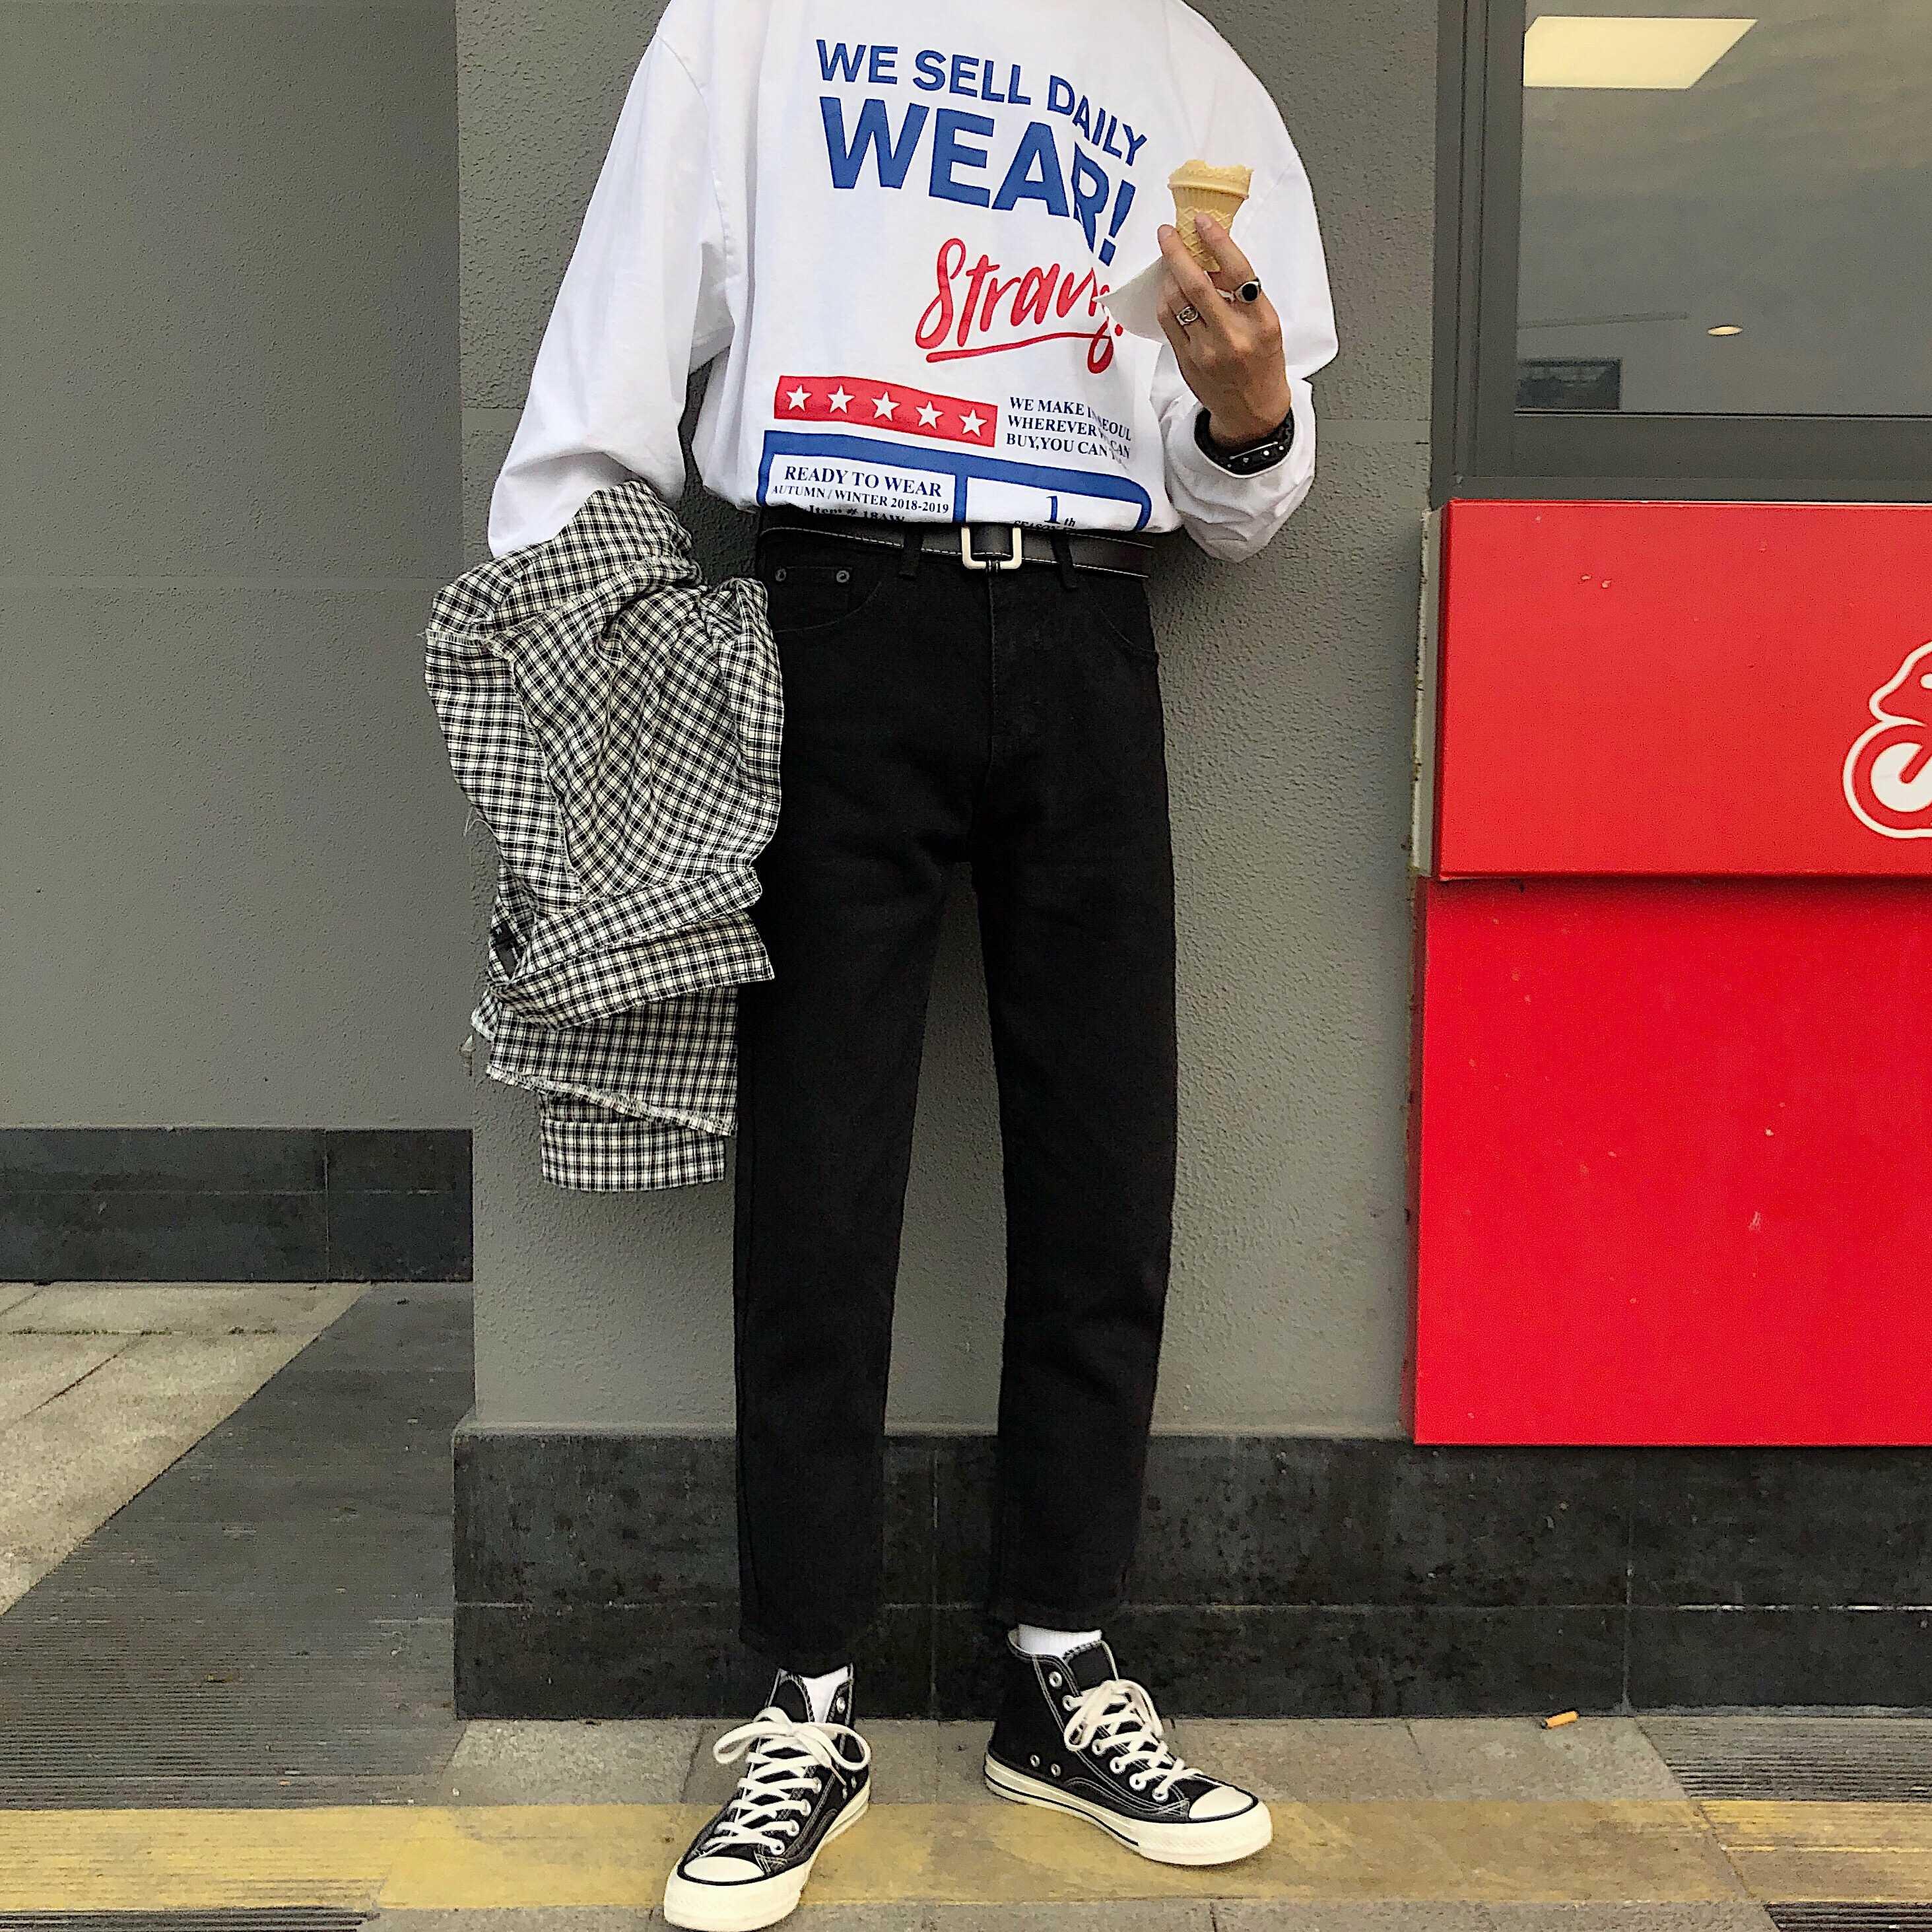 2019 Summer Men's New Trend Casual Pants Stretch Slim Fit Classic Skinny Jeans Men Black/blue Biker Denim Trousers Big Size